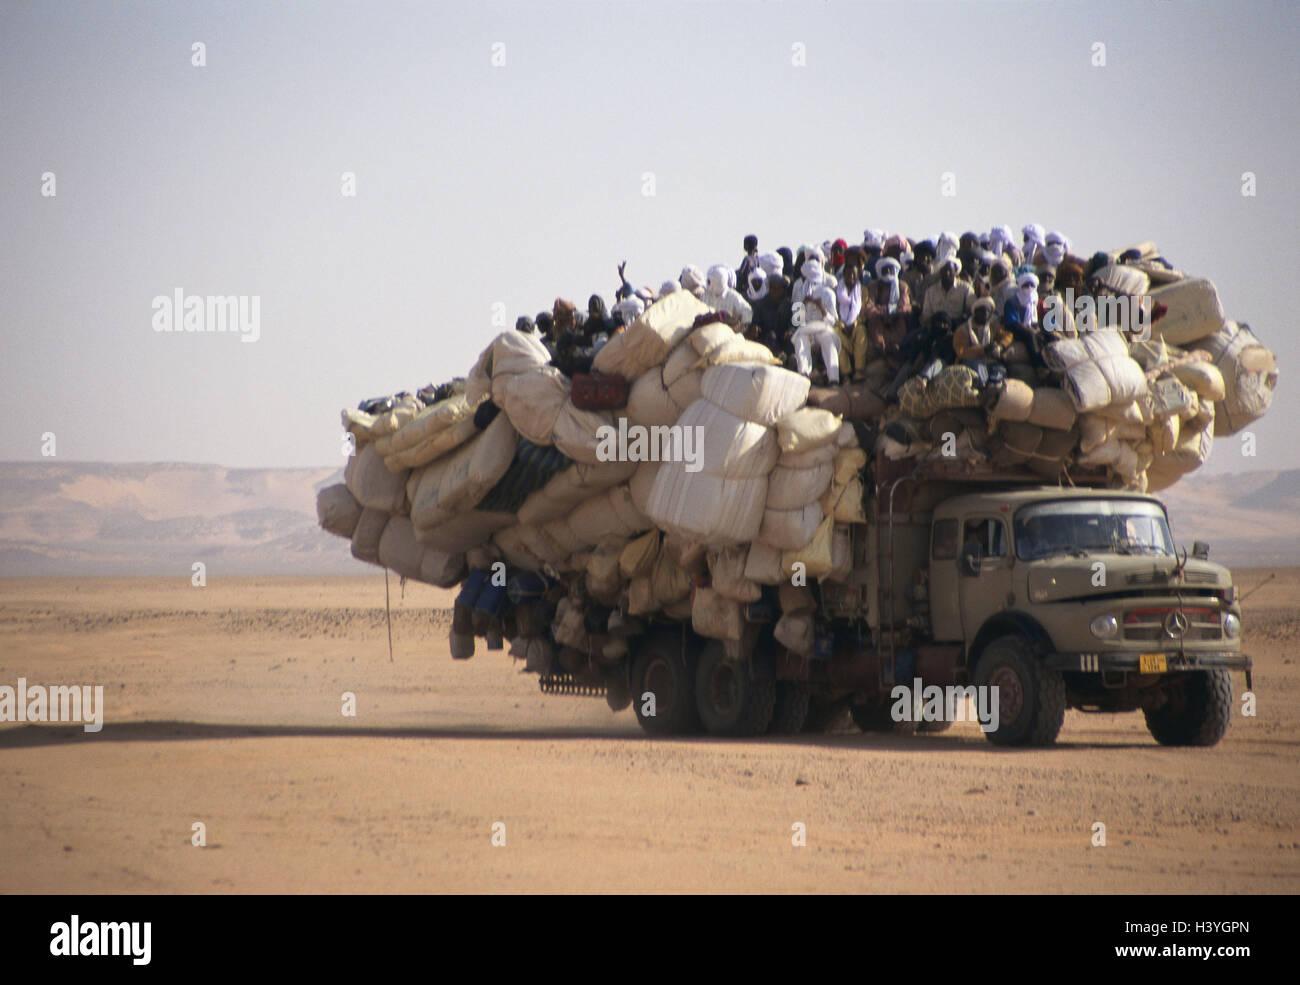 Chad, Borkou, wadi Doum, Sand runway, truck, overcrowds, Central, Africa, landlocked country, Sahara, desert, wild - Stock Image